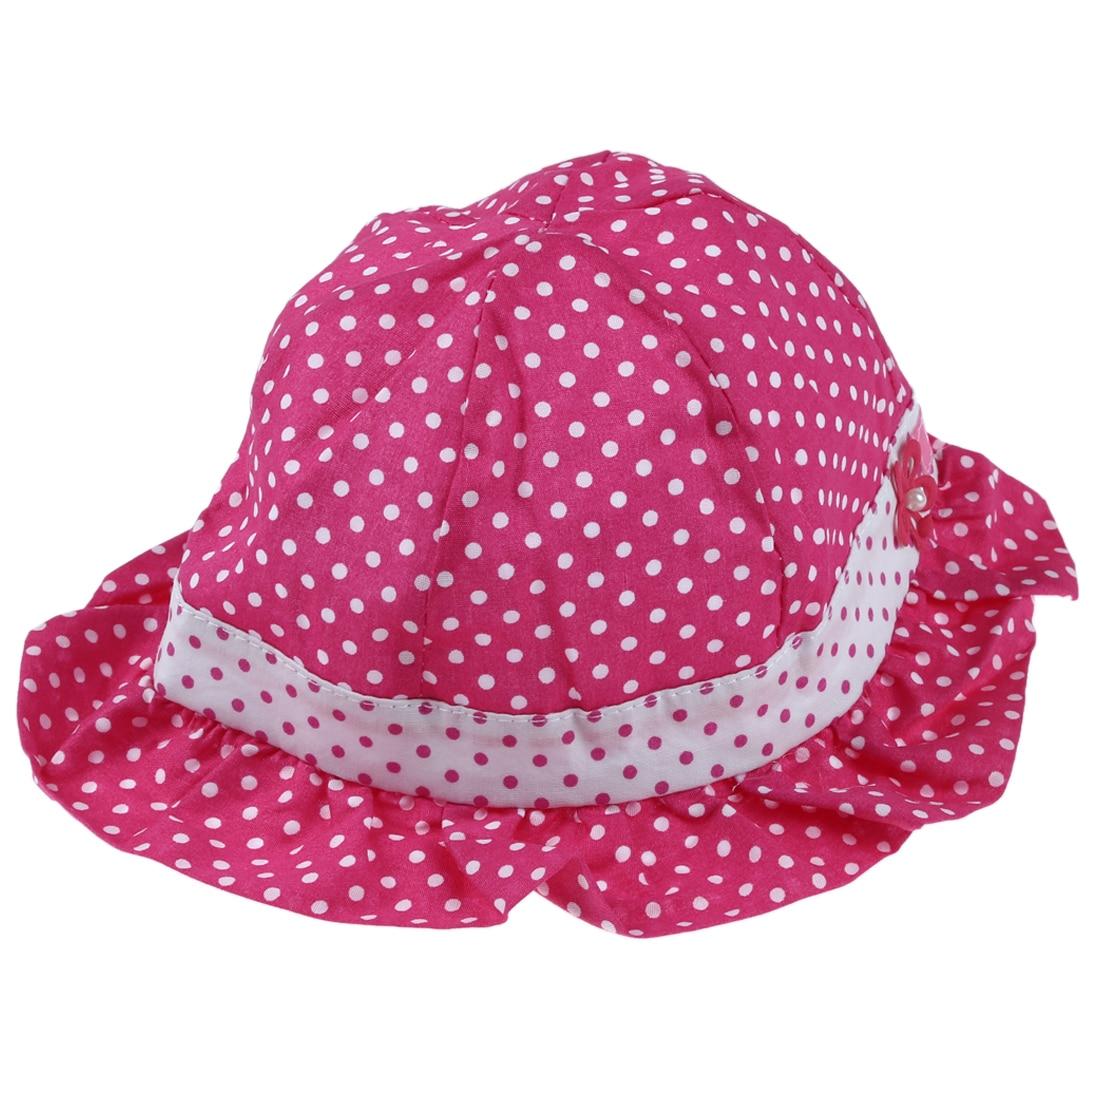 New Sweet Cute Baby children so Polka Summer Caps